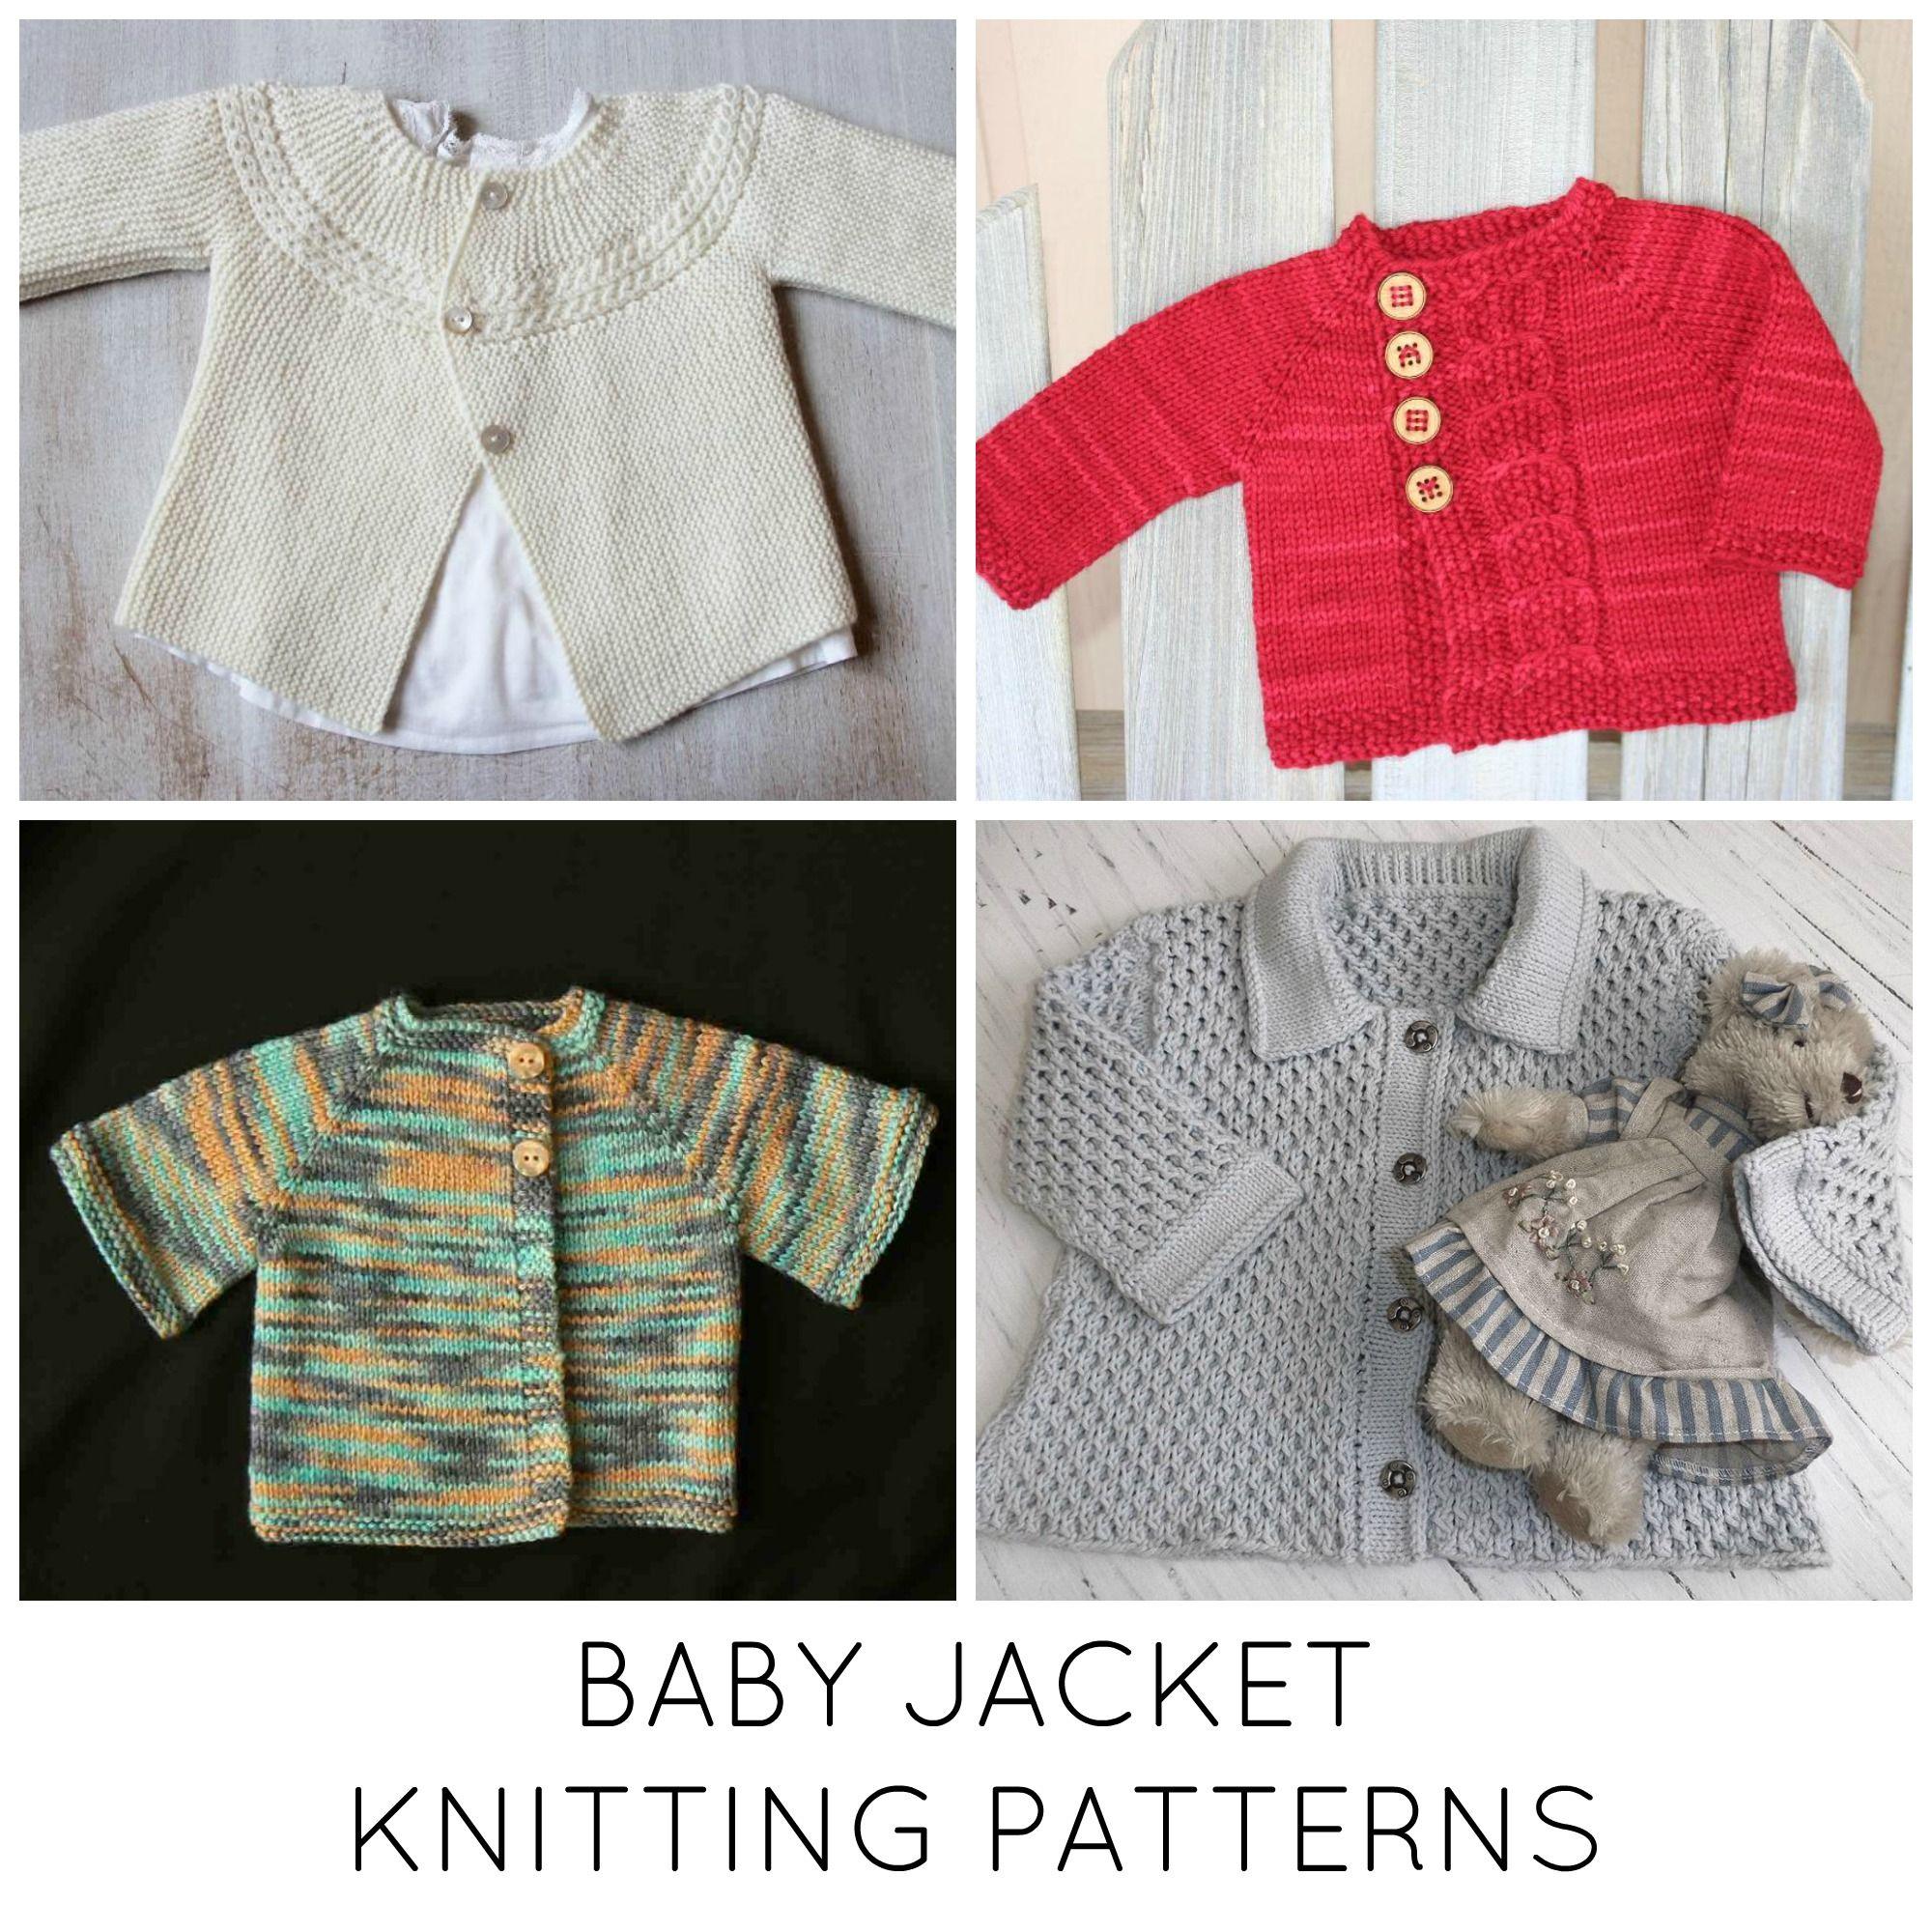 d3edd95a1 10 Baby Jacket Knitting Patterns You ll Love